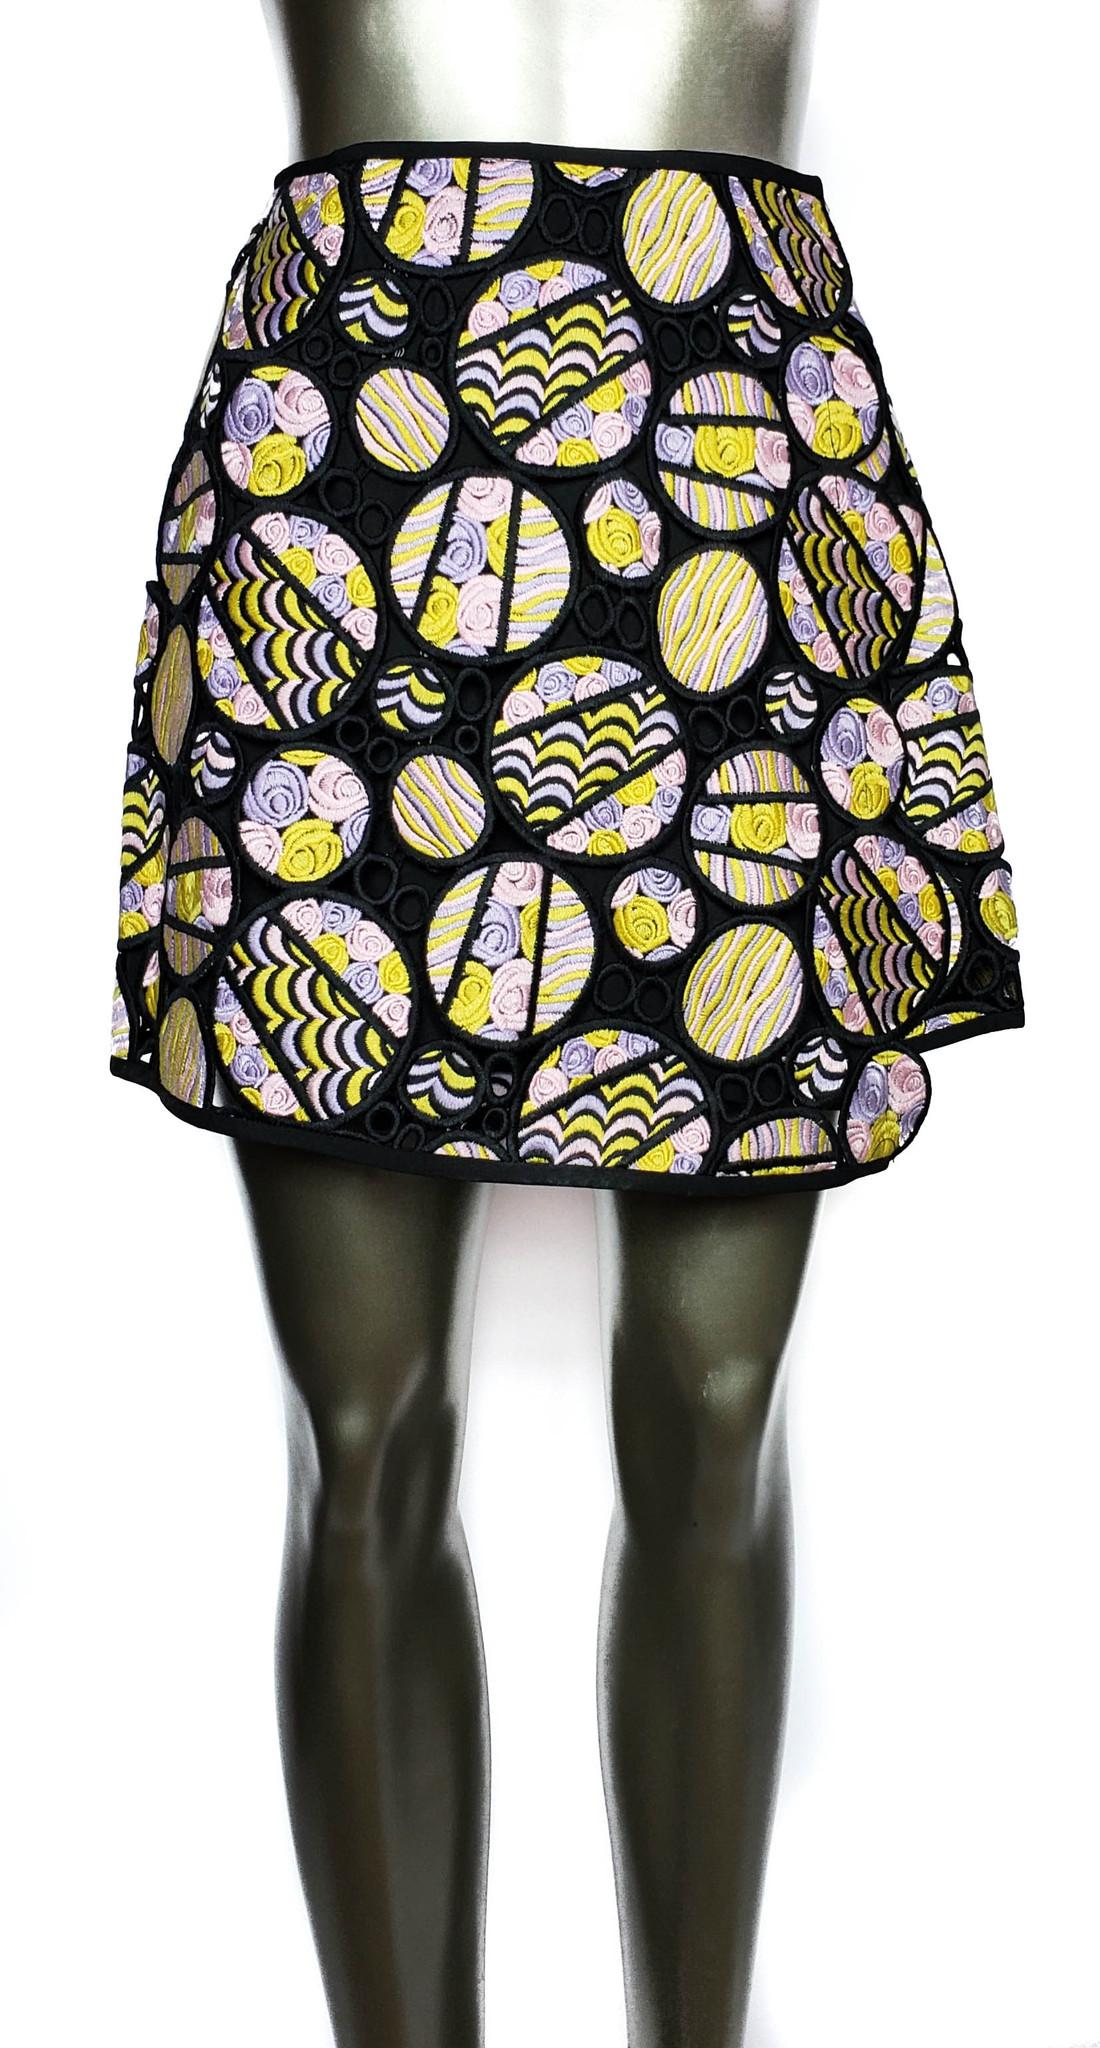 5c4e7a457 Cynthia Rowley Pastels Crochet Circles Slit Wrap Skirt Mini - Size 0 - New  ...